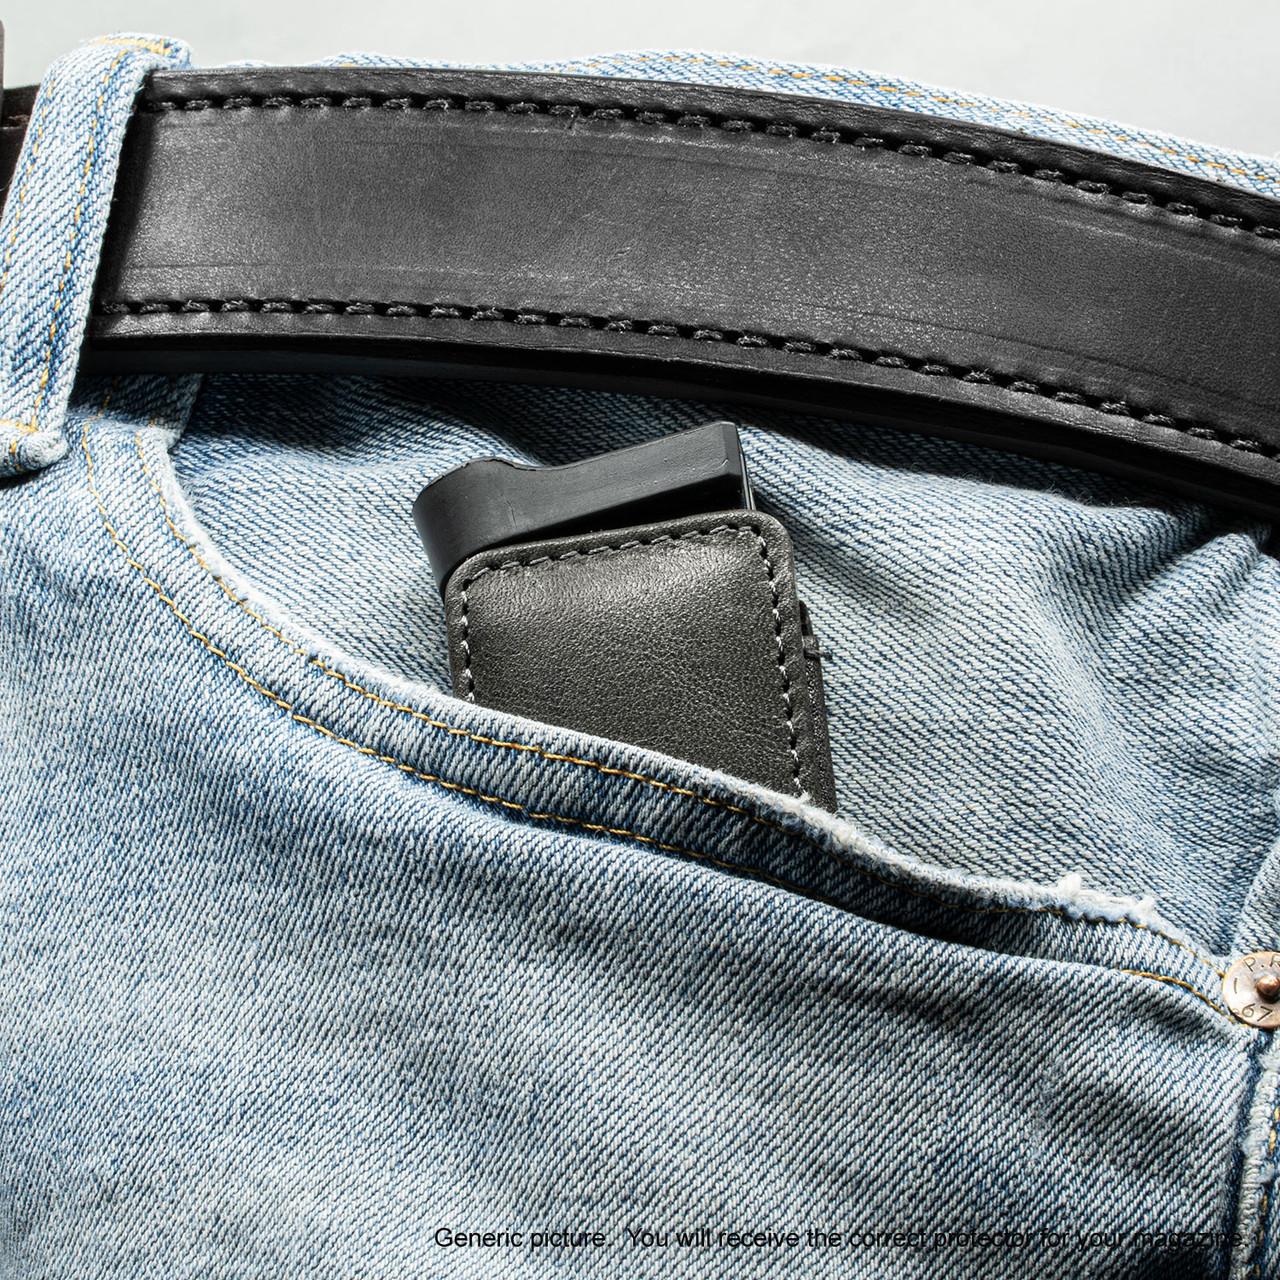 Sig Sauer P232 Black Freedom Magazine Pocket Protector